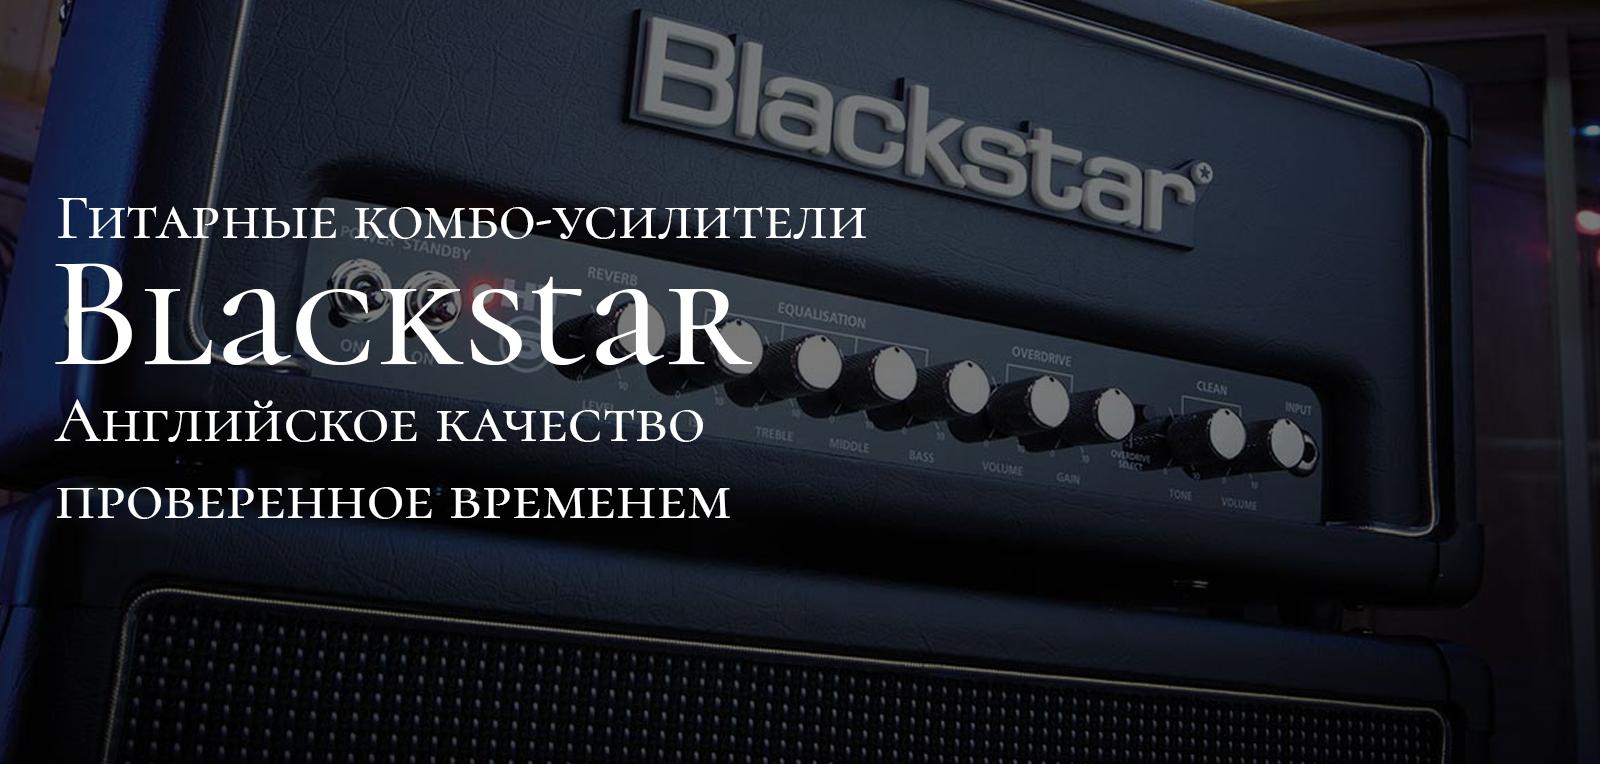 Blackstar комбо-усилители